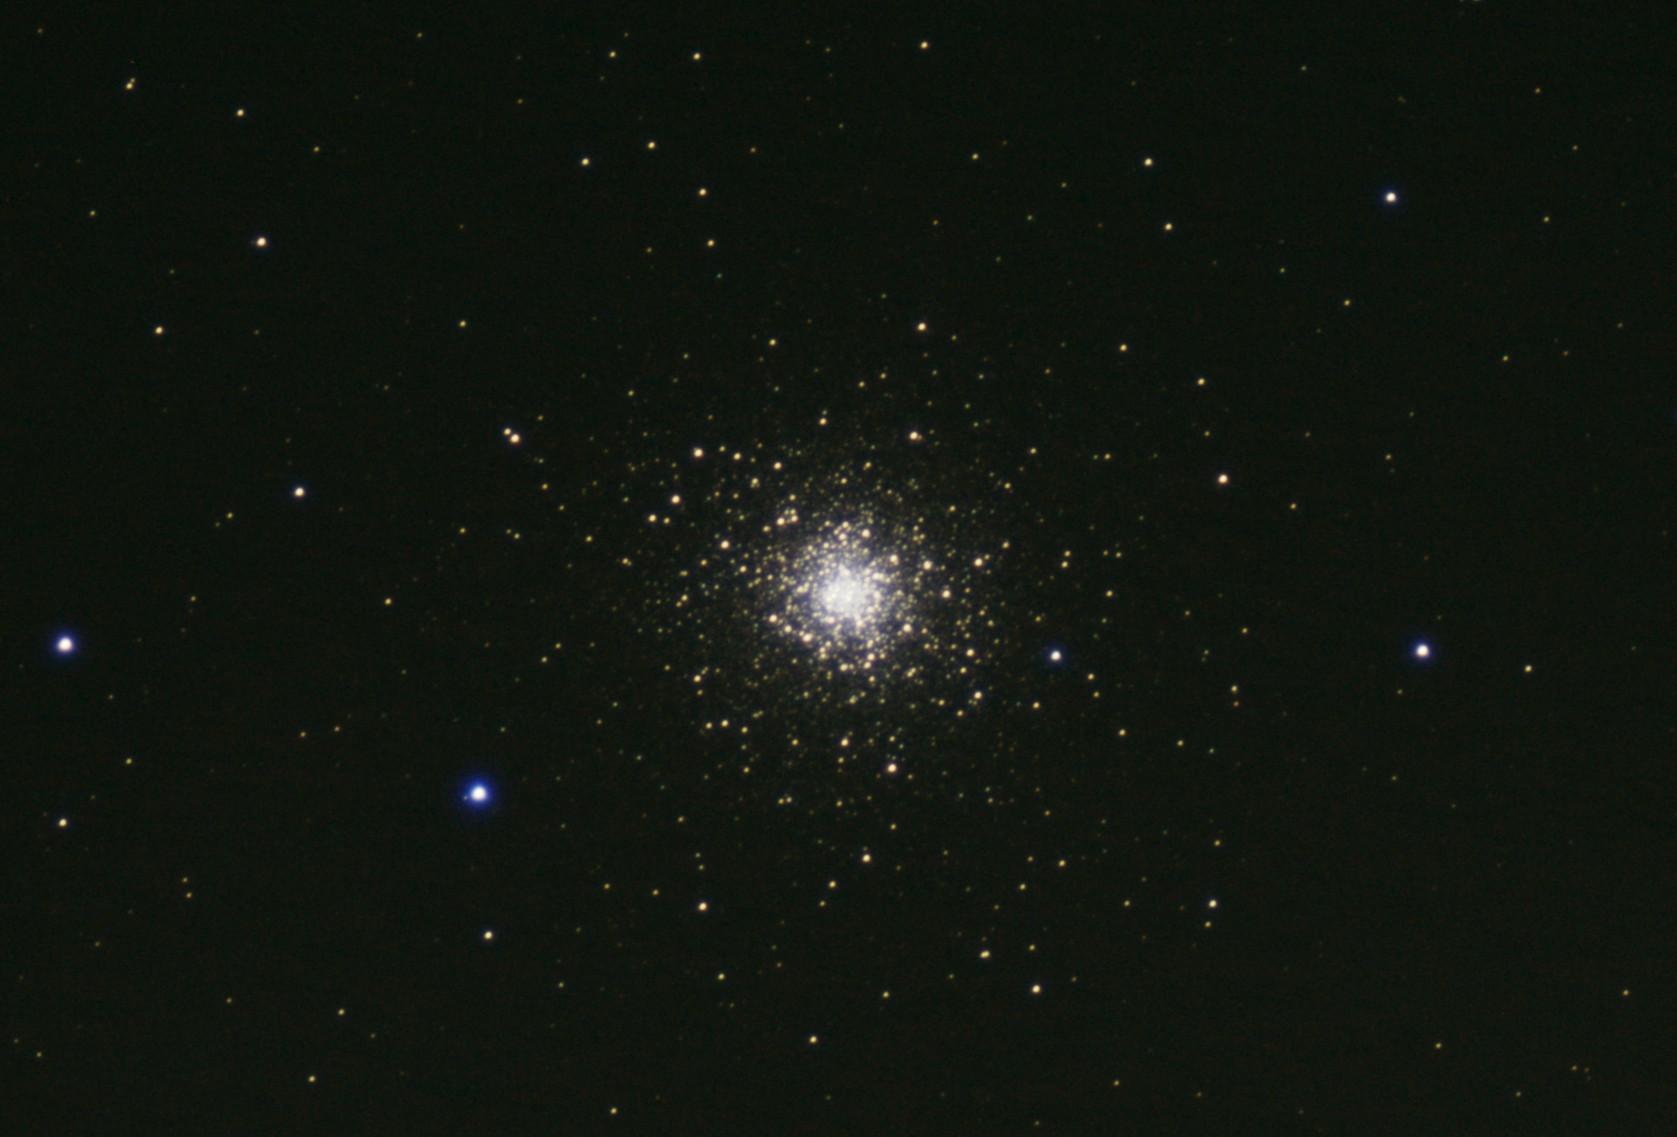 "M92 Hercules Globular Cluster (Jonathan Anderson) 4"" f10 achro on HEQ5 Pro Canon 700d (umod) @ISO 1600 60x40sec + darks,flats etc. Processed DSS & GIMP"